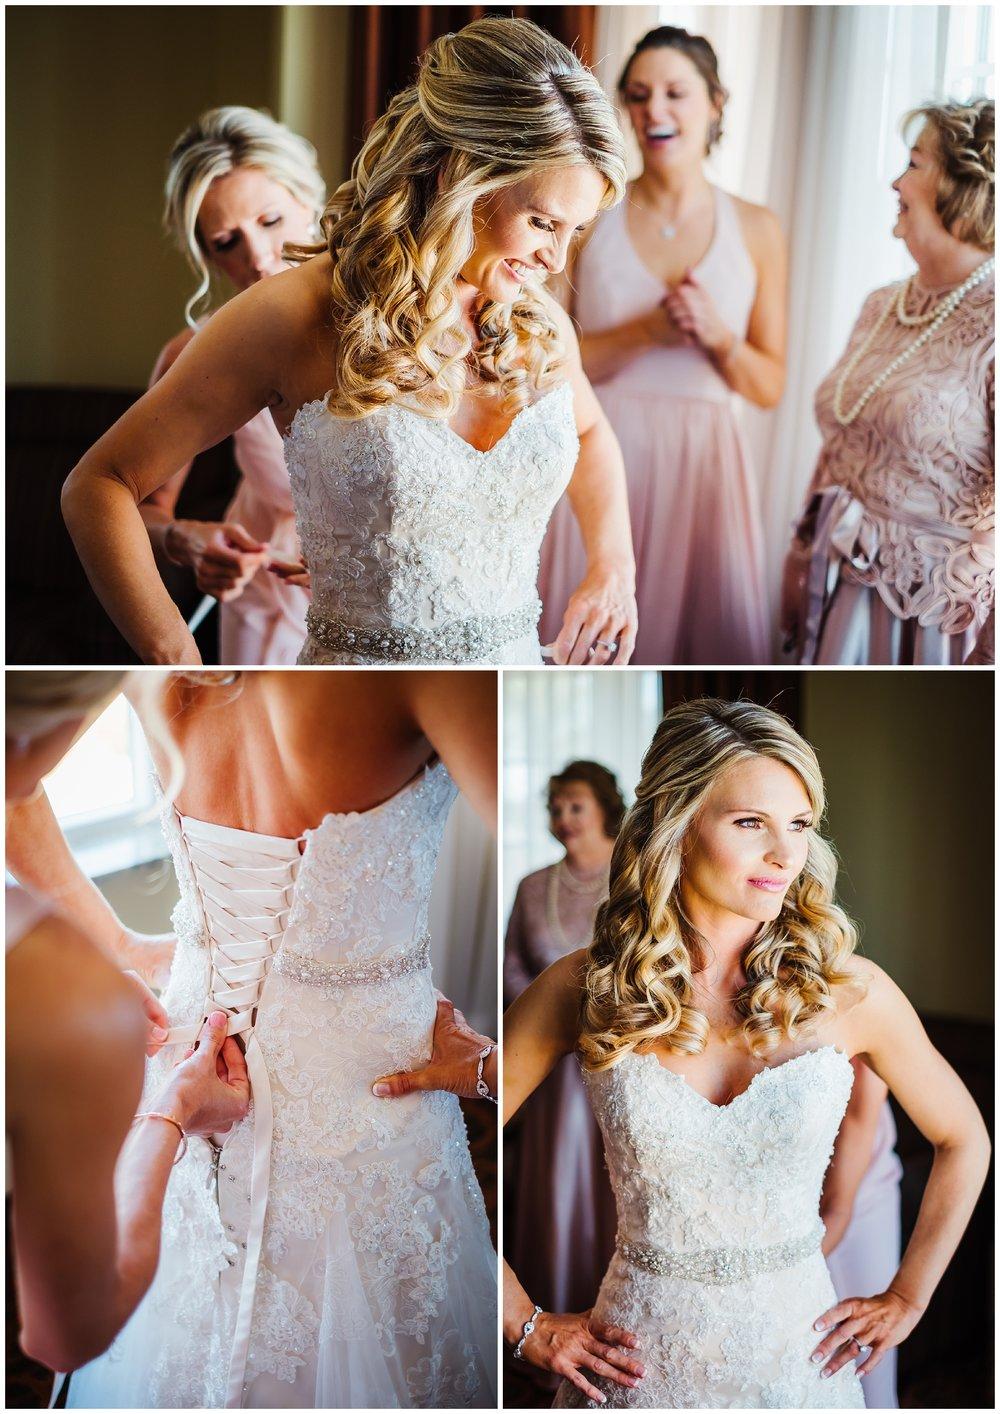 tampa-bradenton-wedding-photographer-south-florida-museum-classic-blush-gold-alpacas-sparklers_0011.jpg